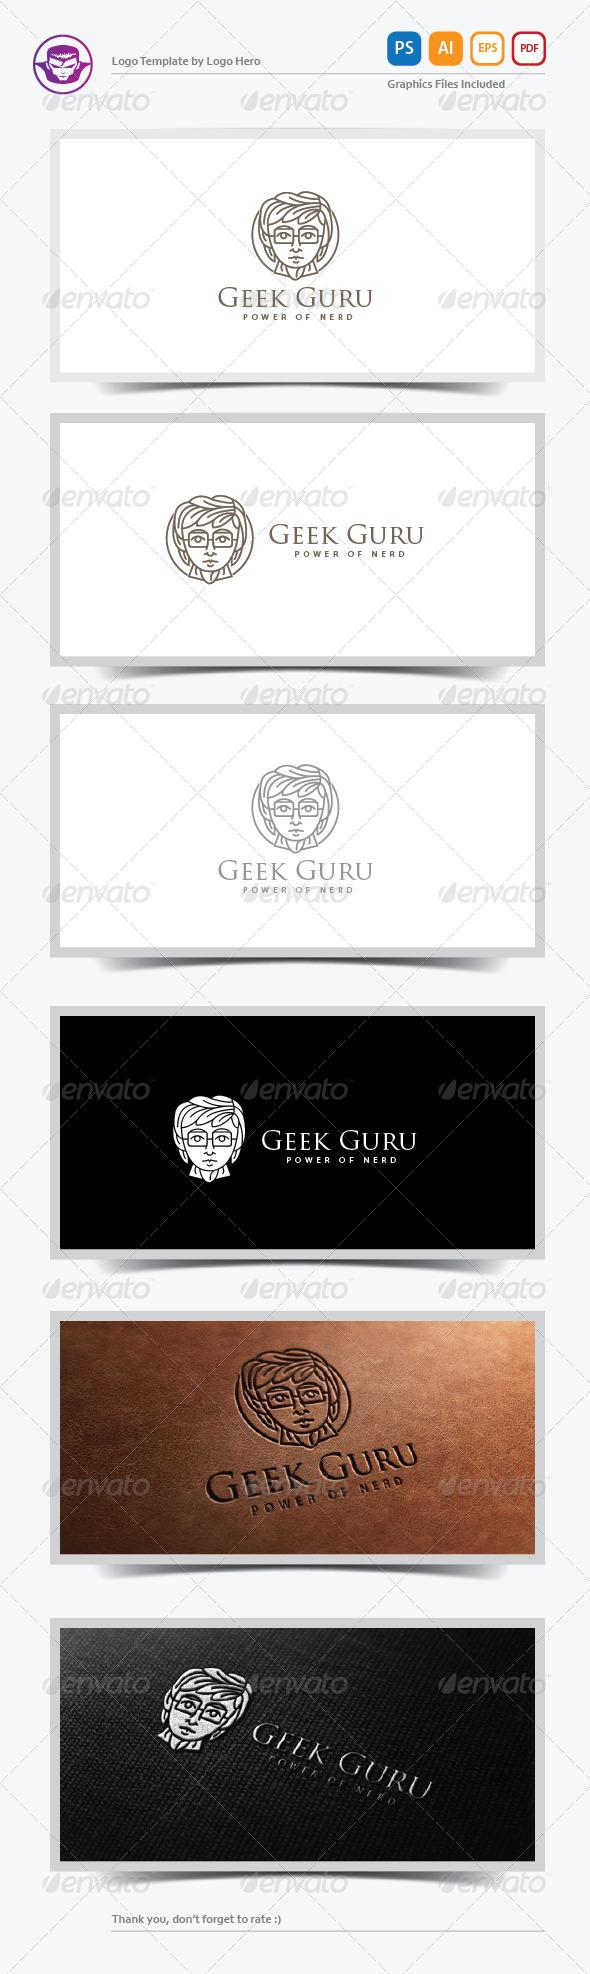 GraphicRiver Geek Guru Logo Template 6418769